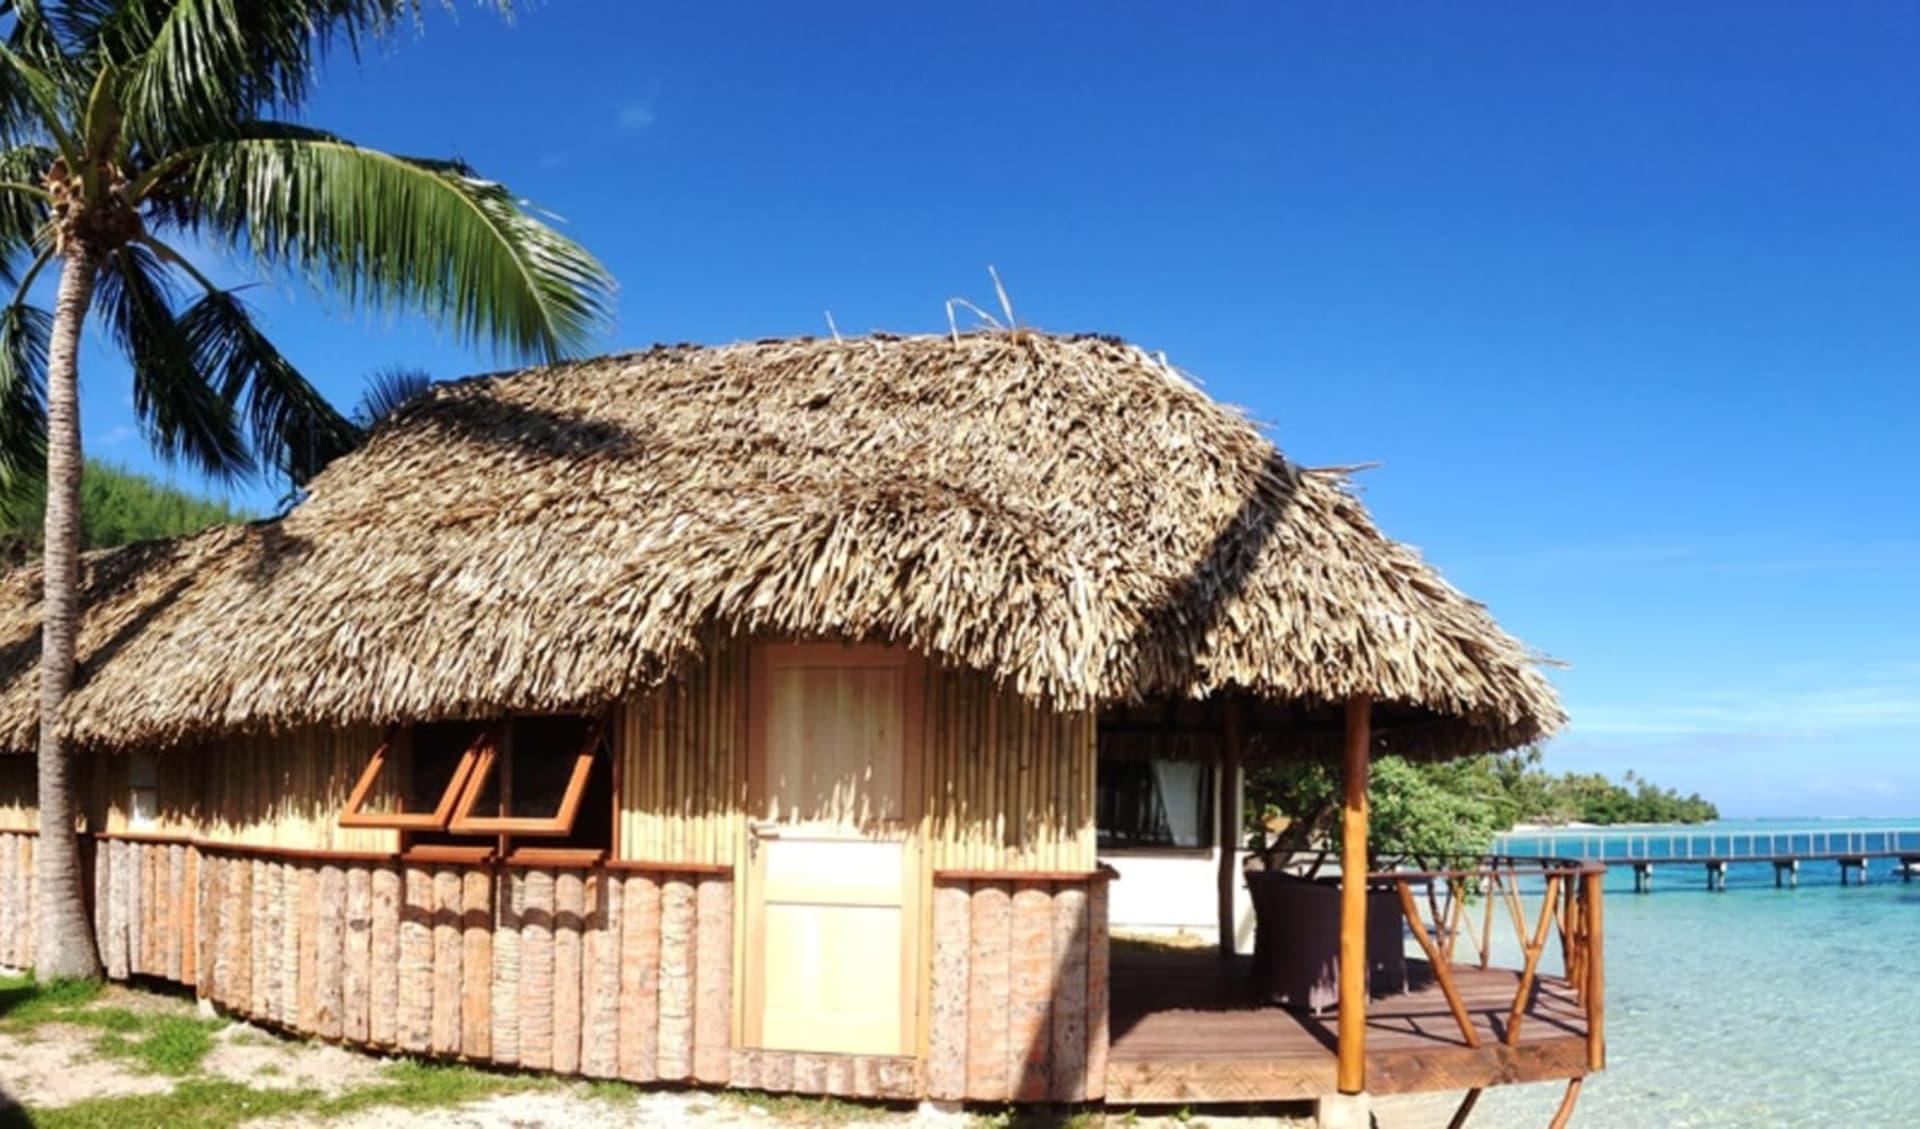 Le Mahana in Huahine:  Hotel Le Mahana - Traditionnal Fare (1)